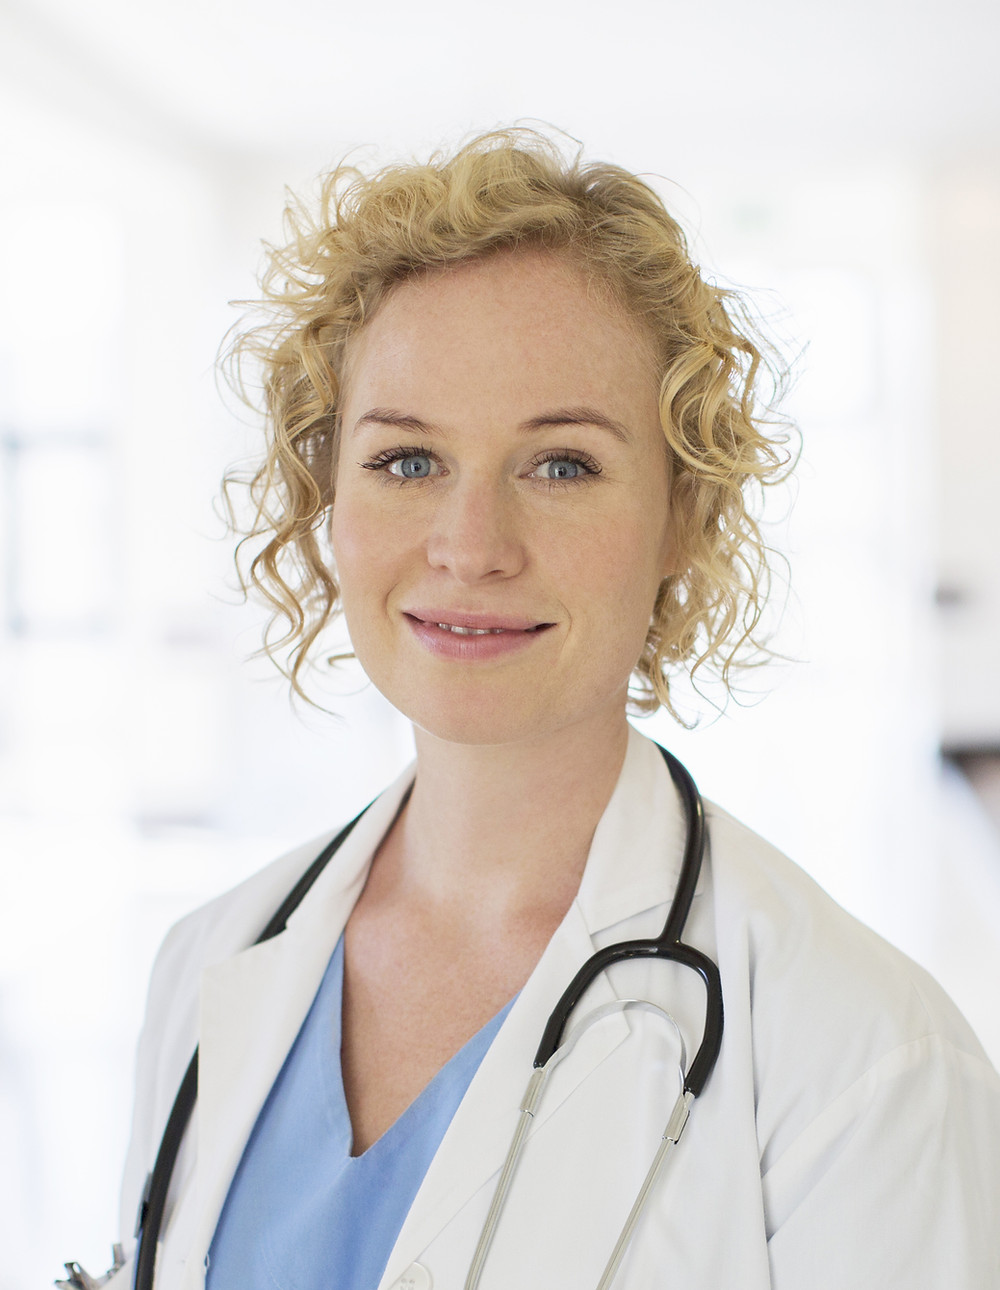 Nurse injector